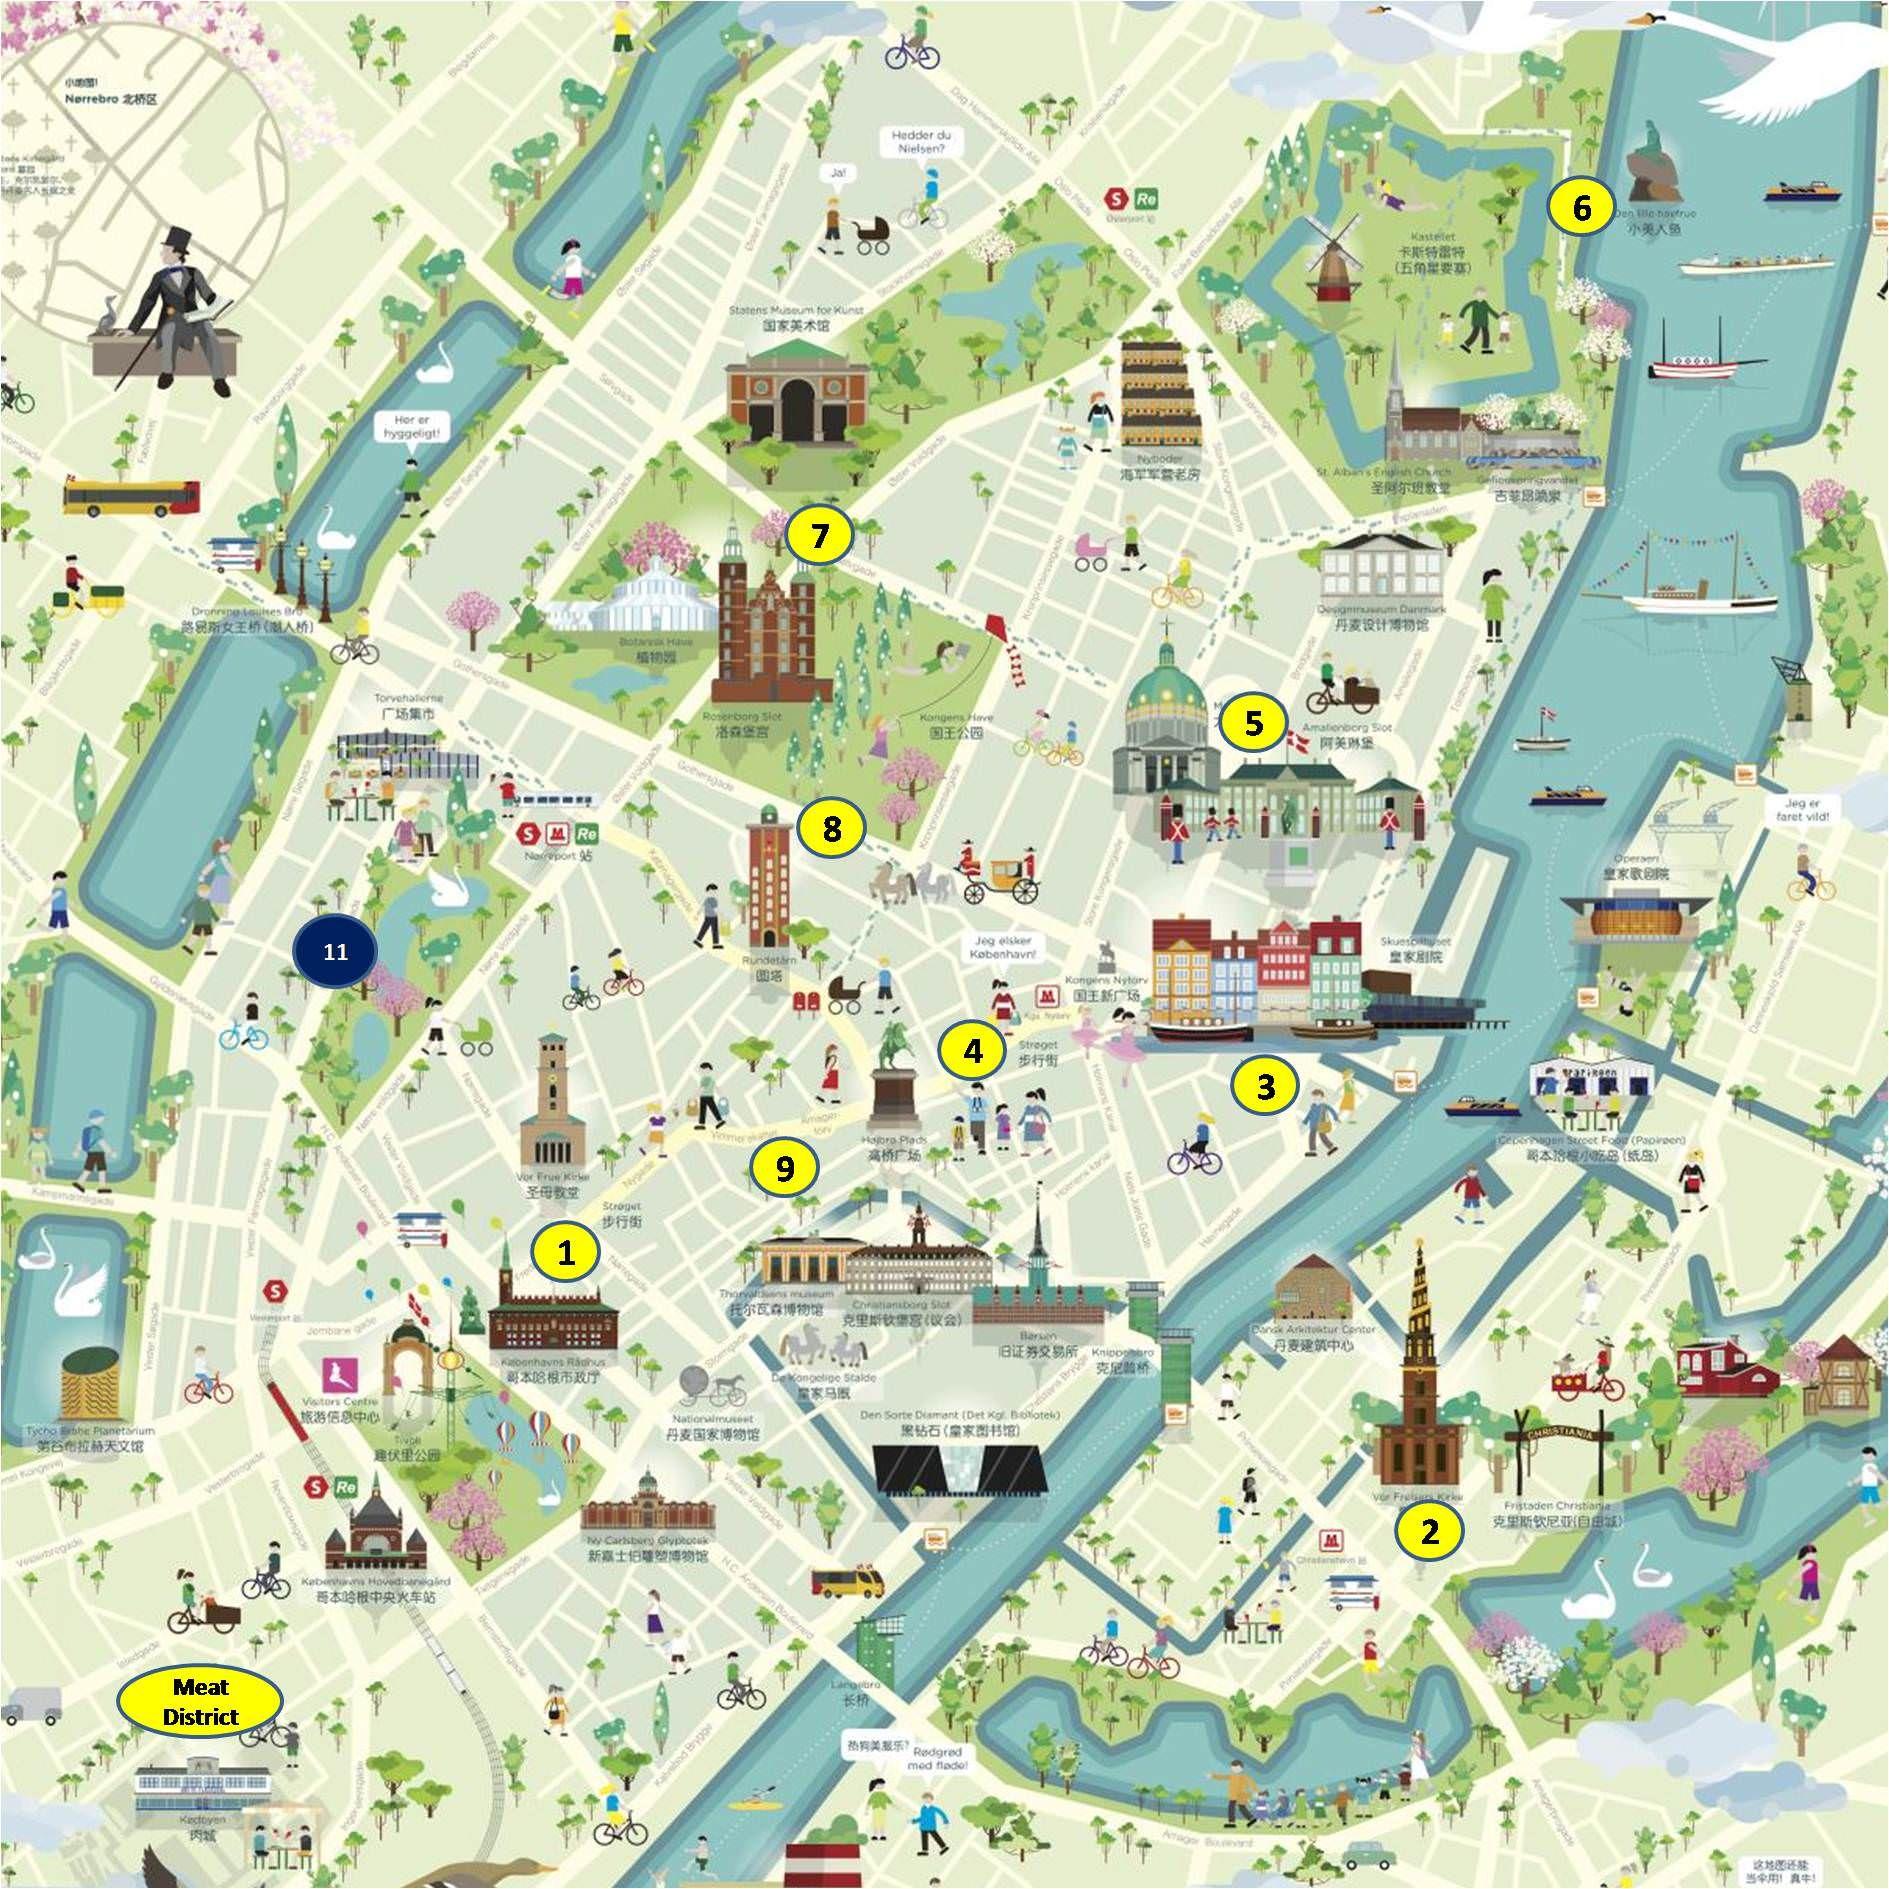 copenhaga mapa tusguiasdeviaje.wp content uploads 2016 02 Mapa de turismo de  copenhaga mapa